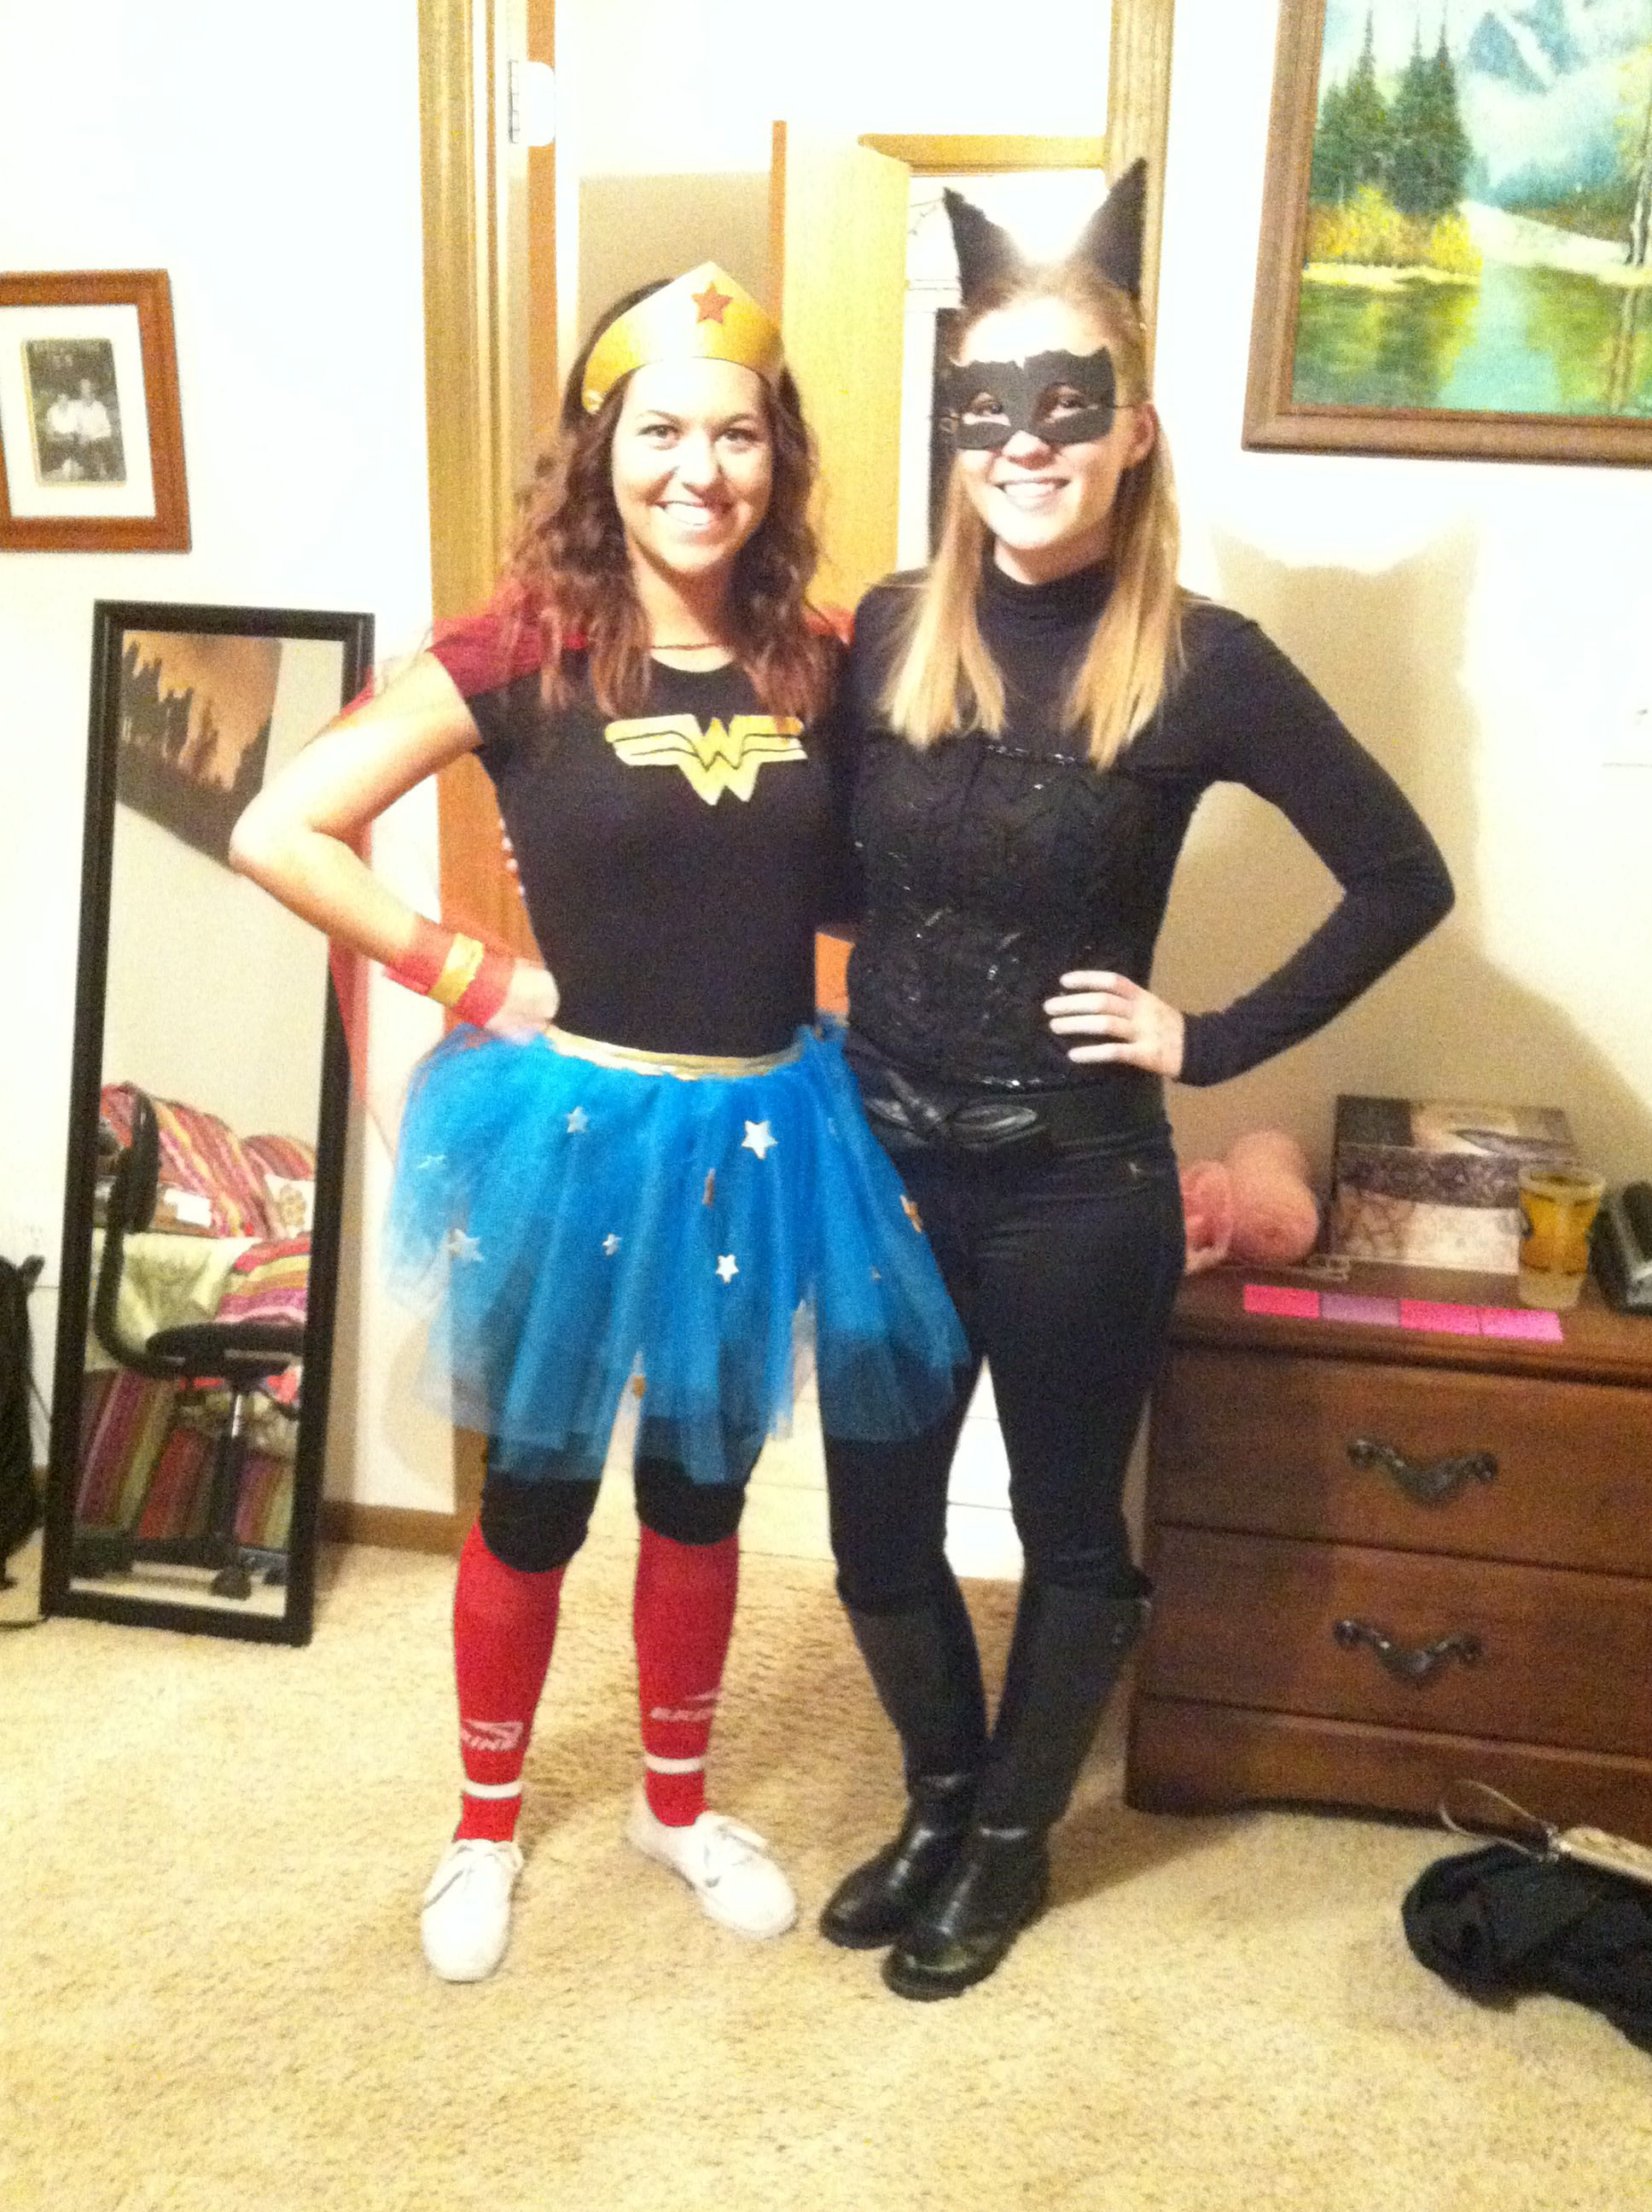 Wonder women and cat women! Fighting crime! Halloween